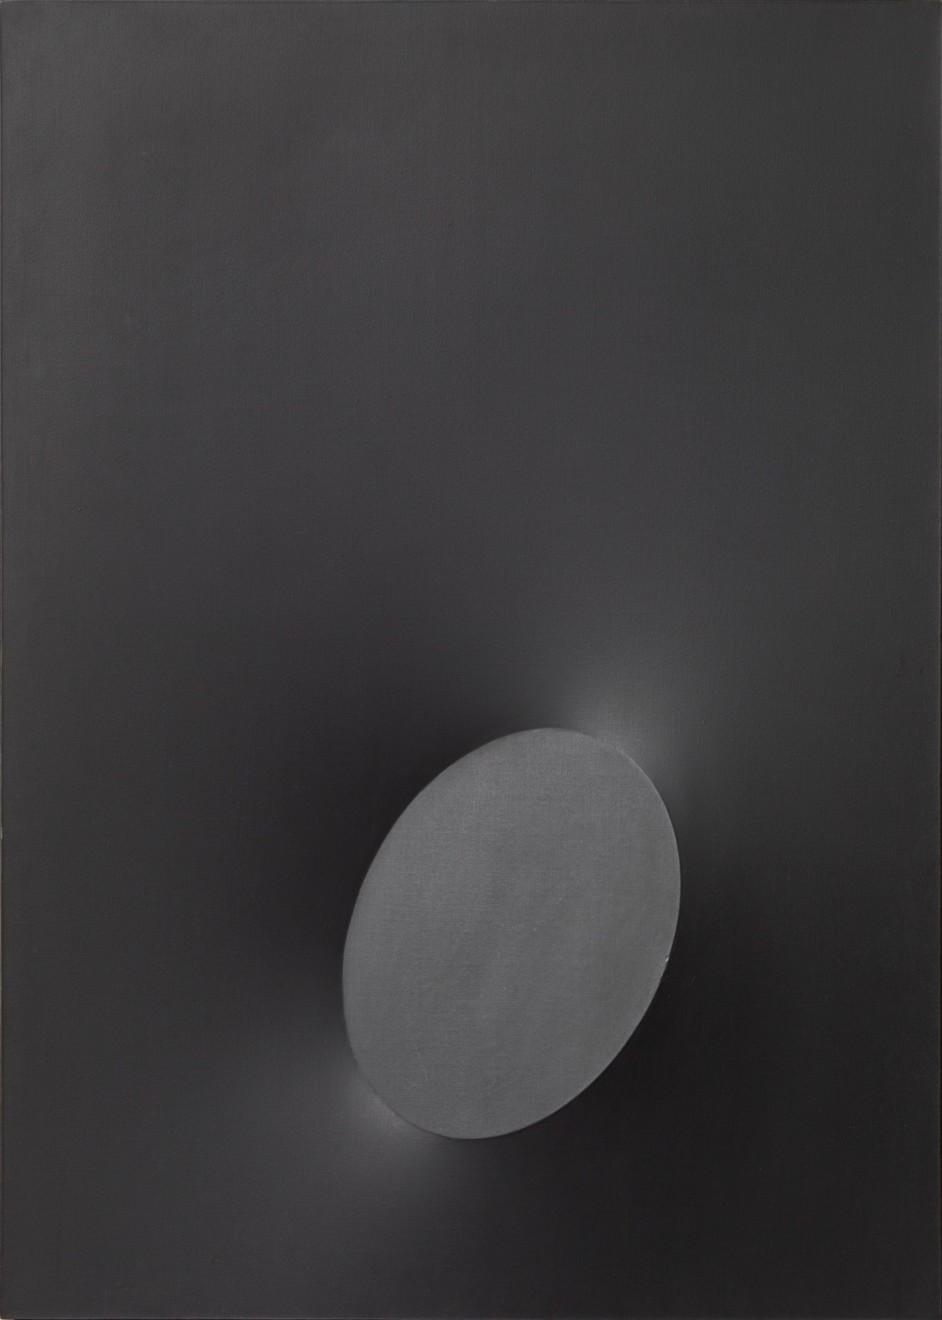 A Black Oval